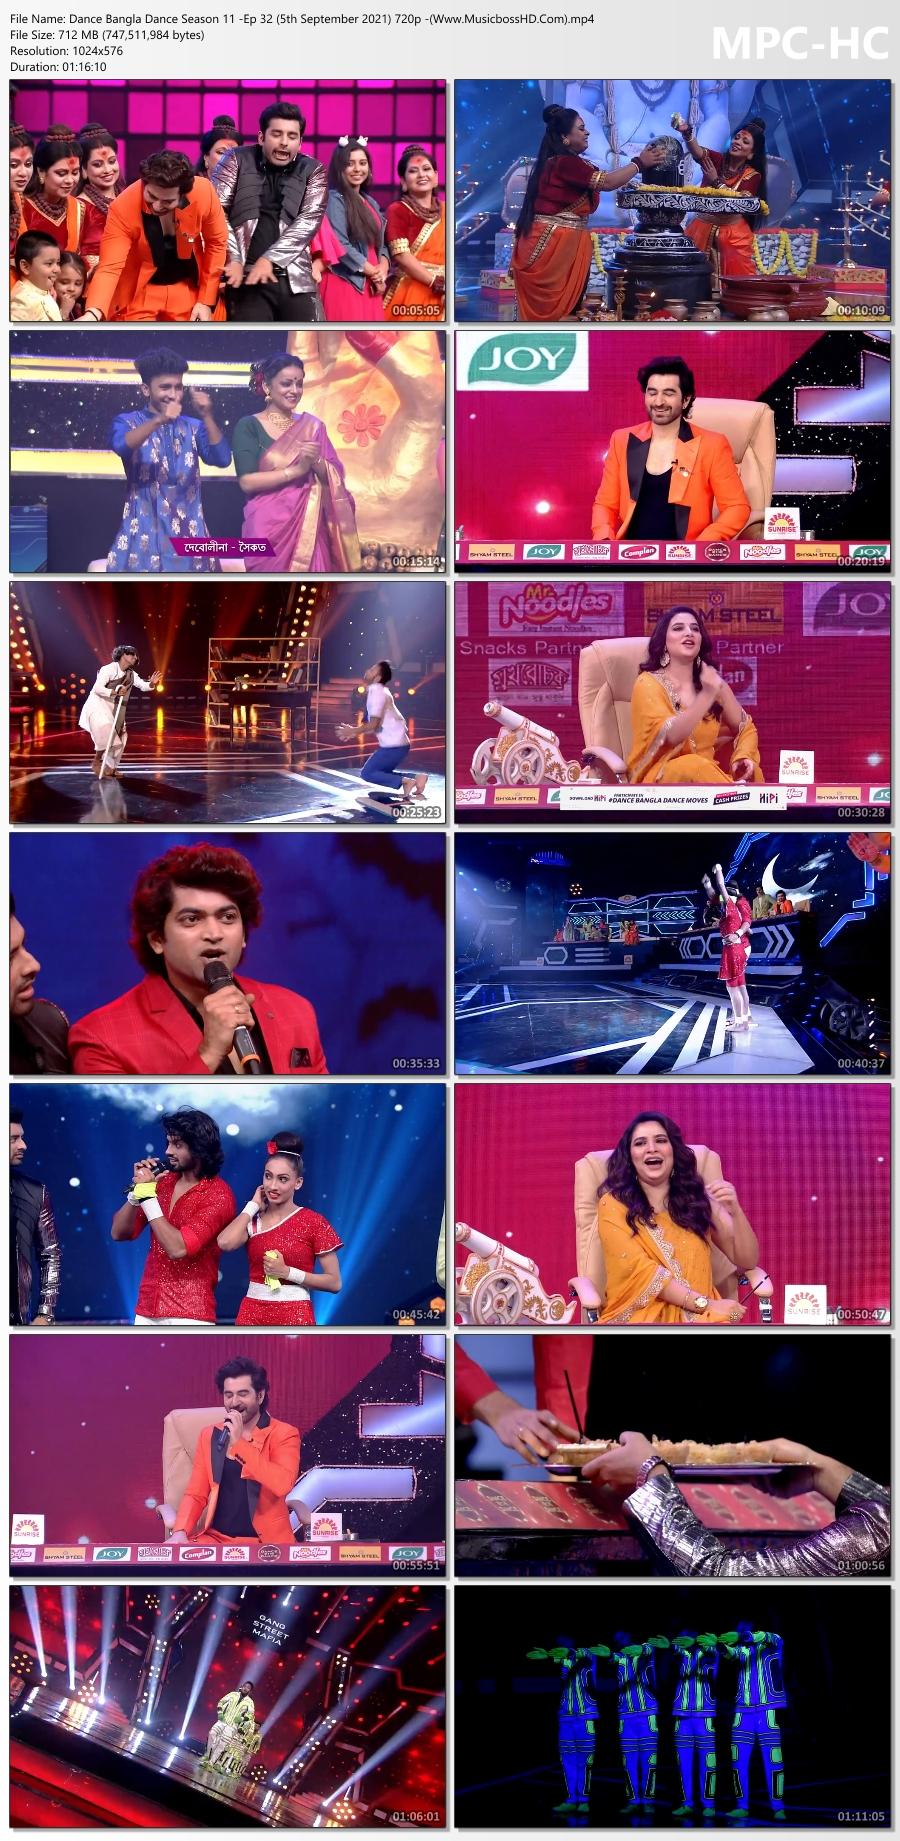 Dance-Bangla-Dance-Season-11-Ep-32-5th-September-2021-720p-Www-Musicboss-HD-Com-mp4-thumbs